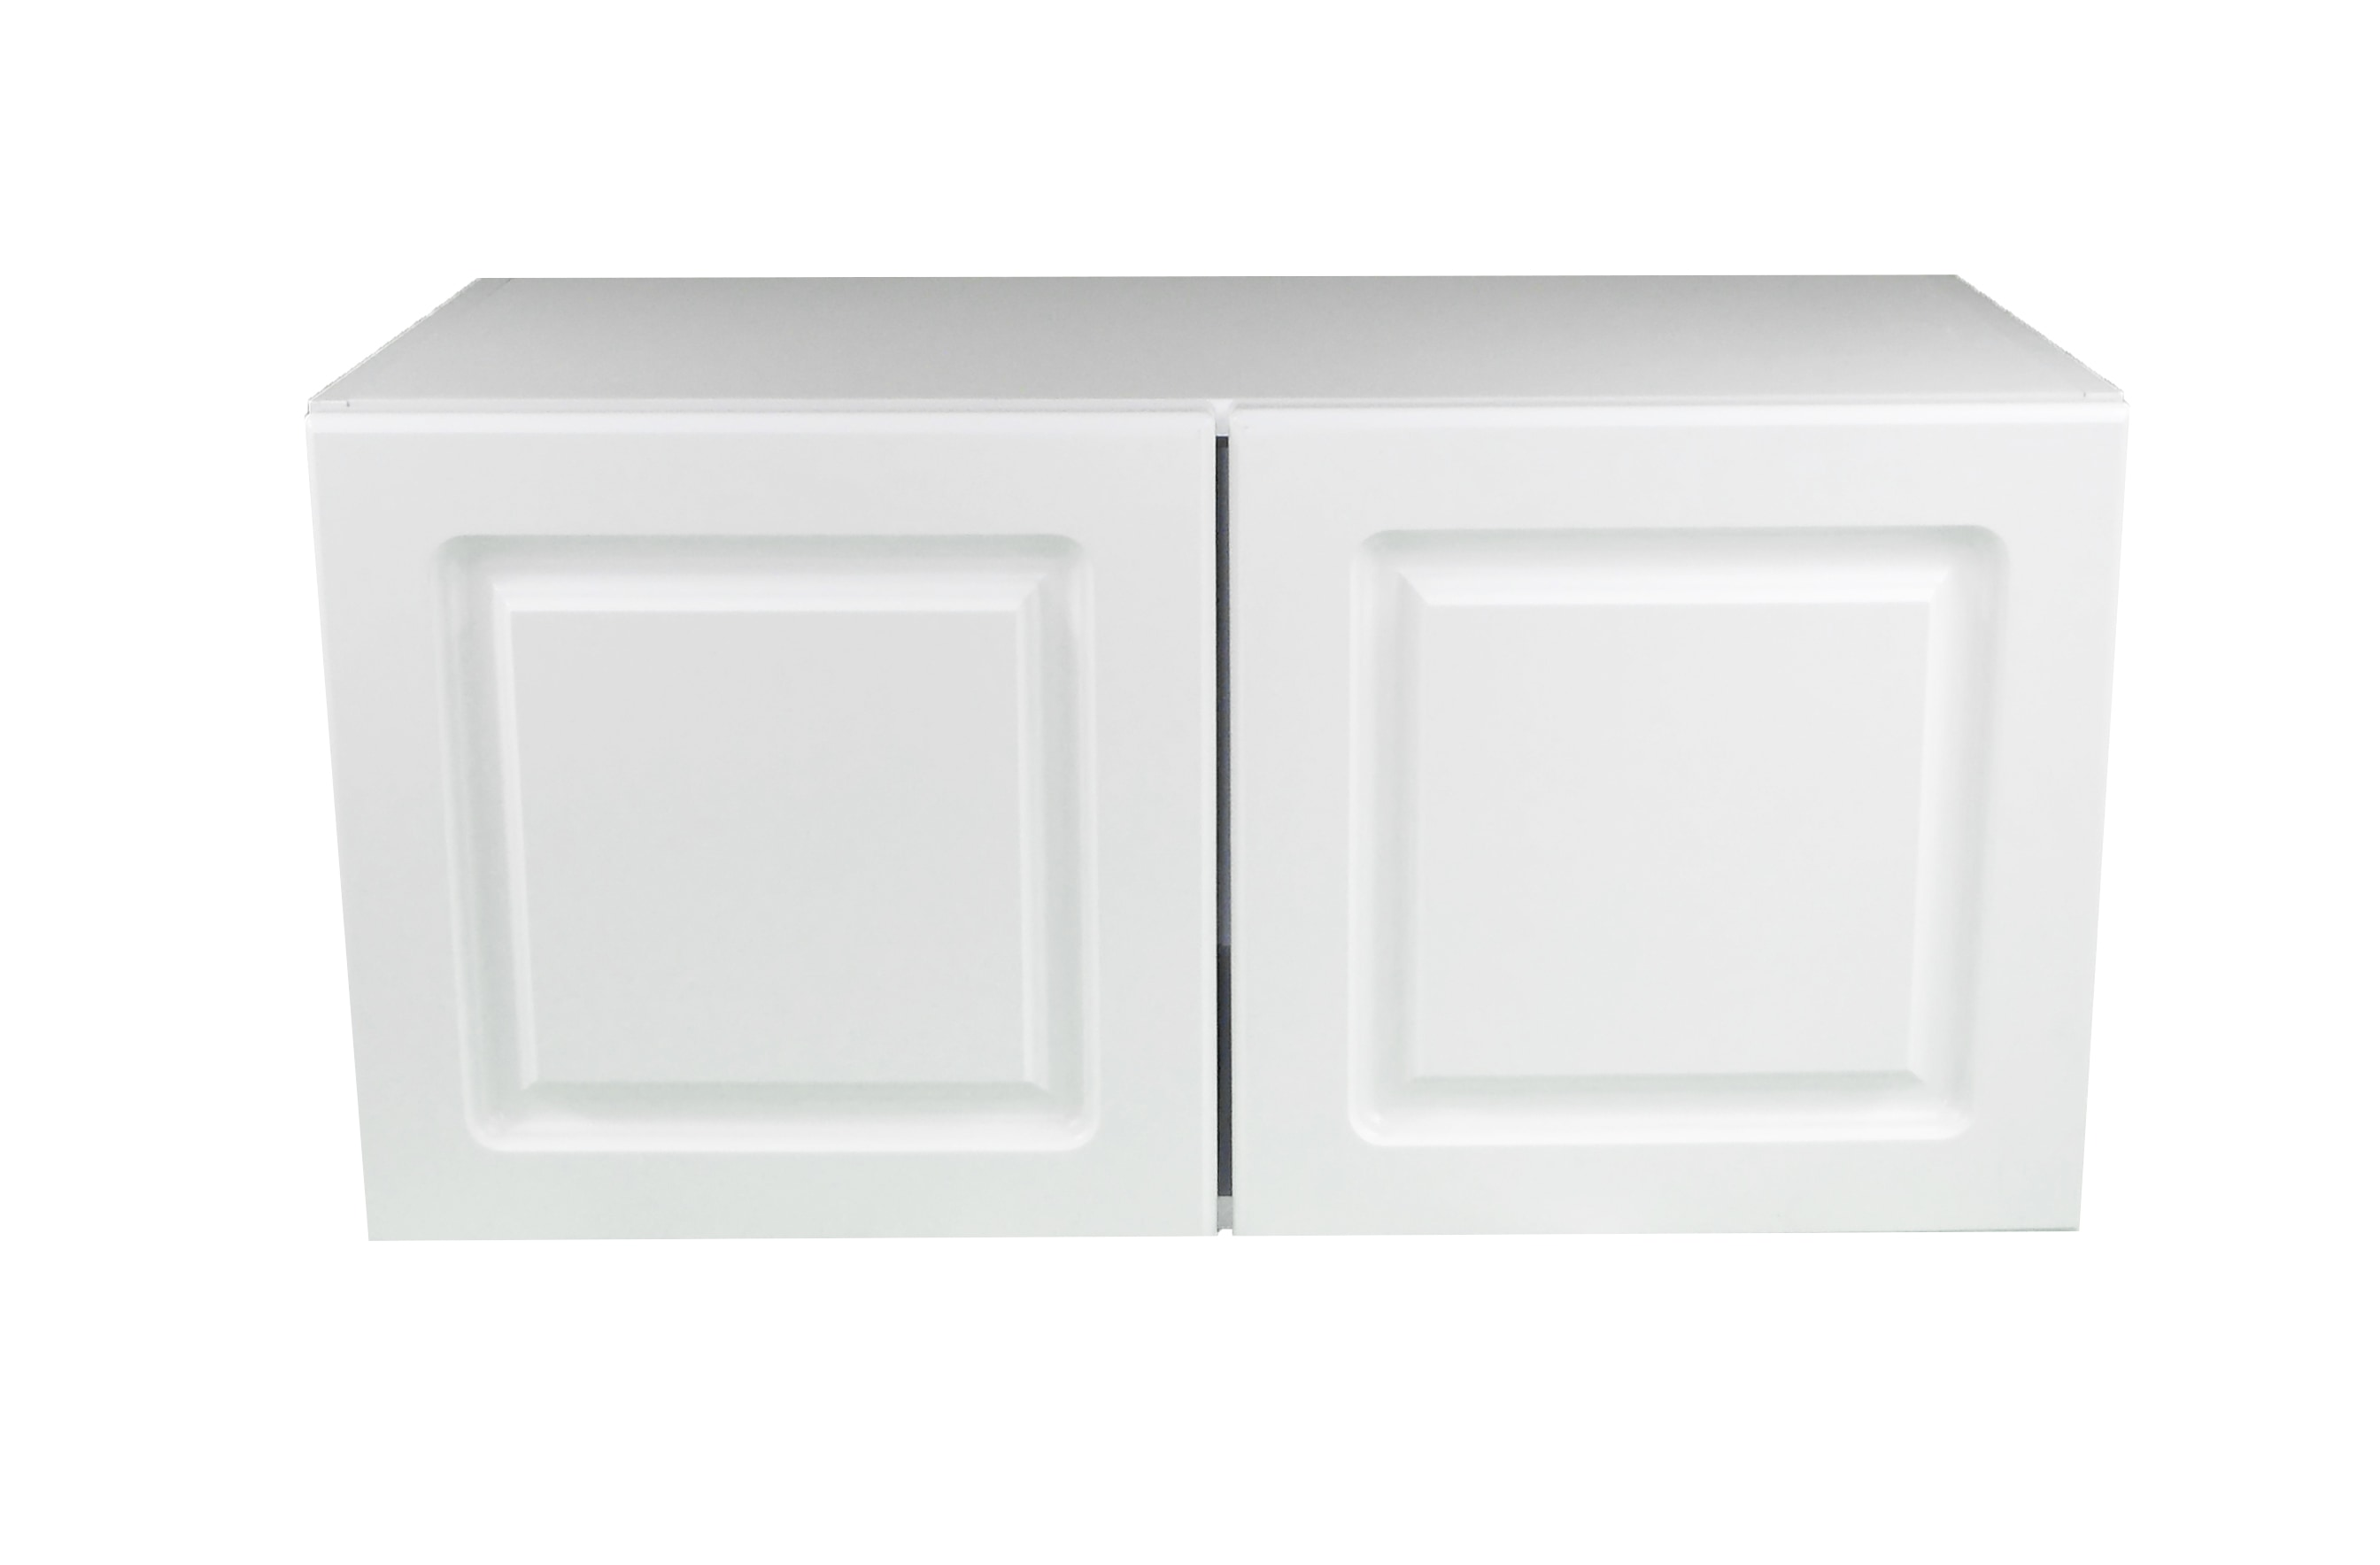 Appliance Wall Cabinet with 2 Doors / San Juan / Raised Panel White / 30x15 San Juan 0